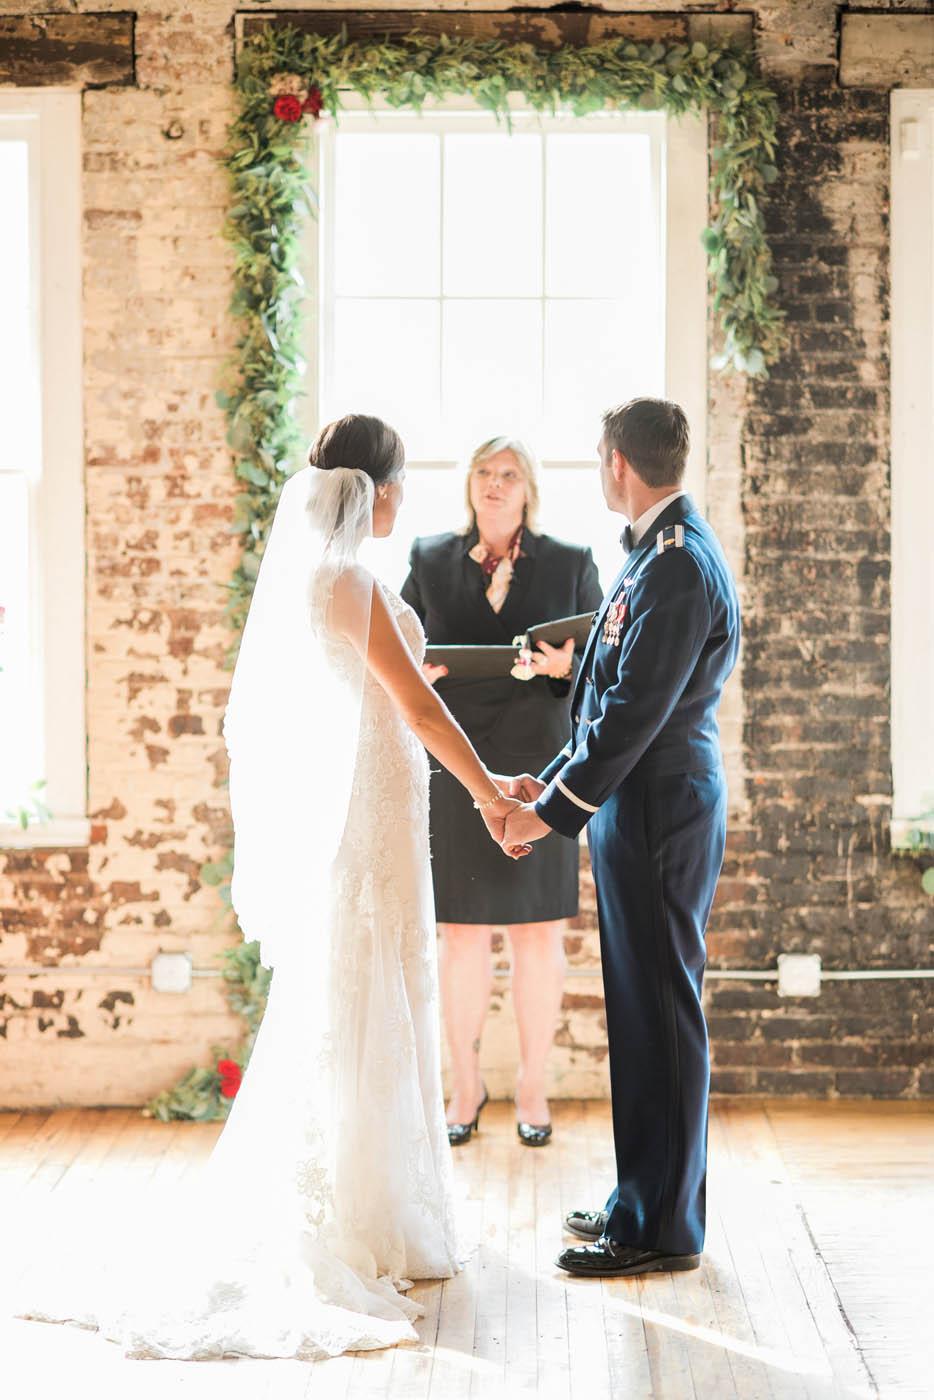 stockroom-at-230-wedding-7.jpg